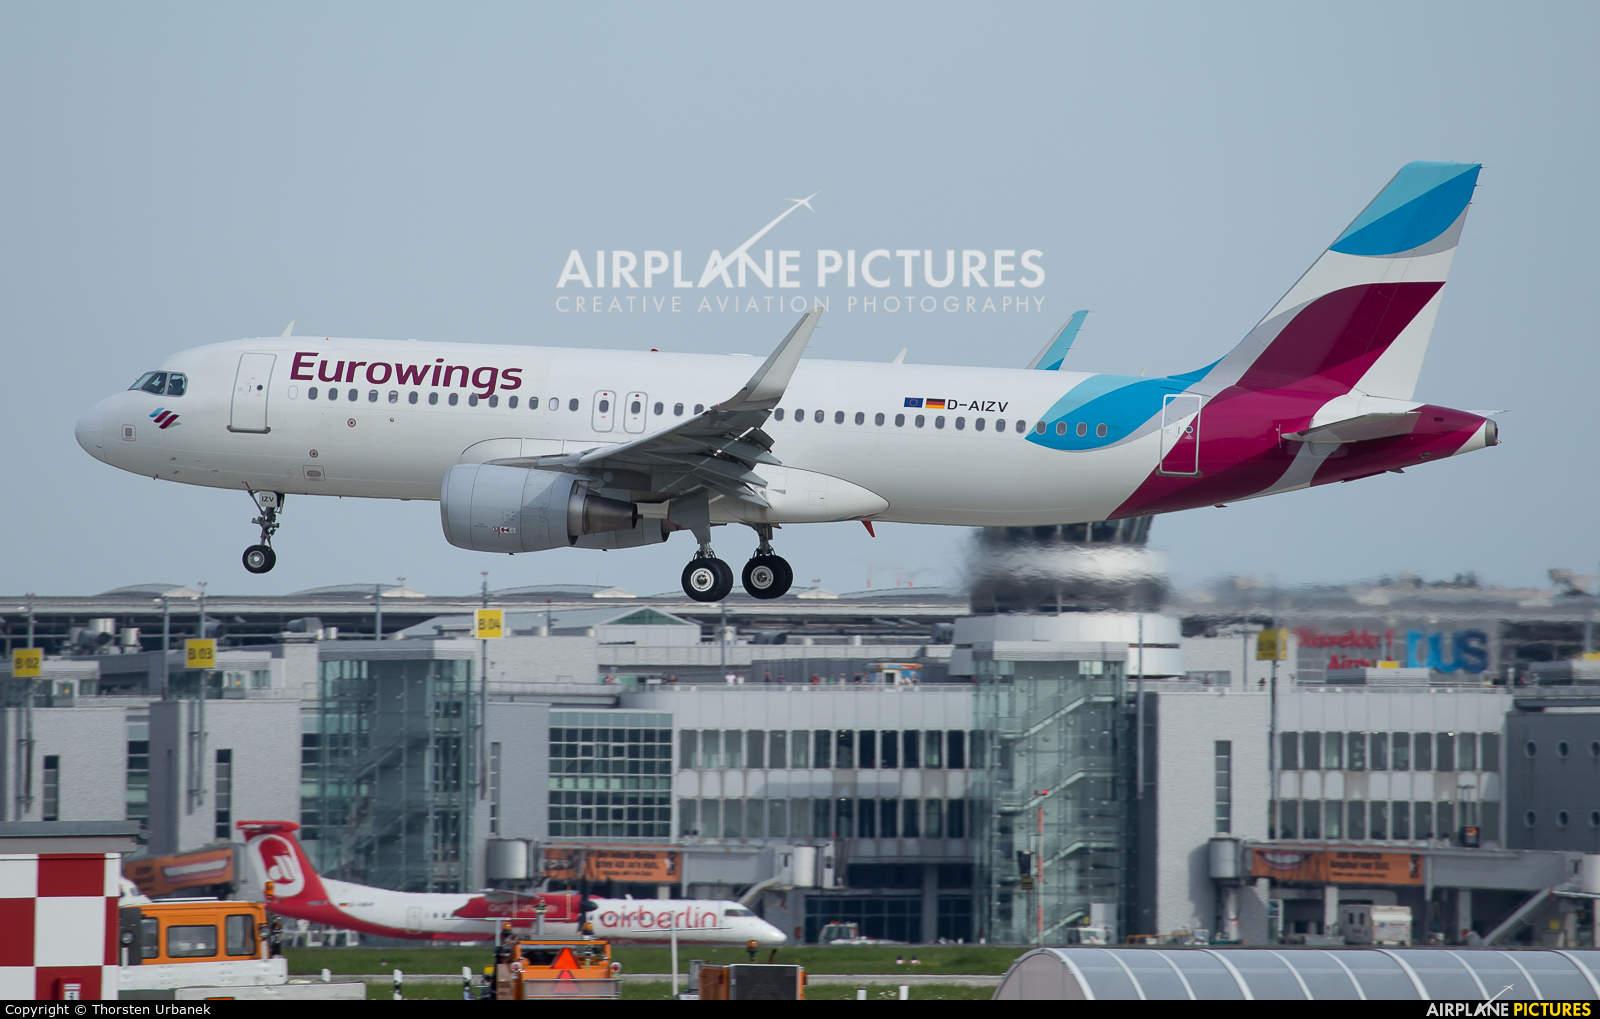 Flights Attendants at Eurowings go on Strike